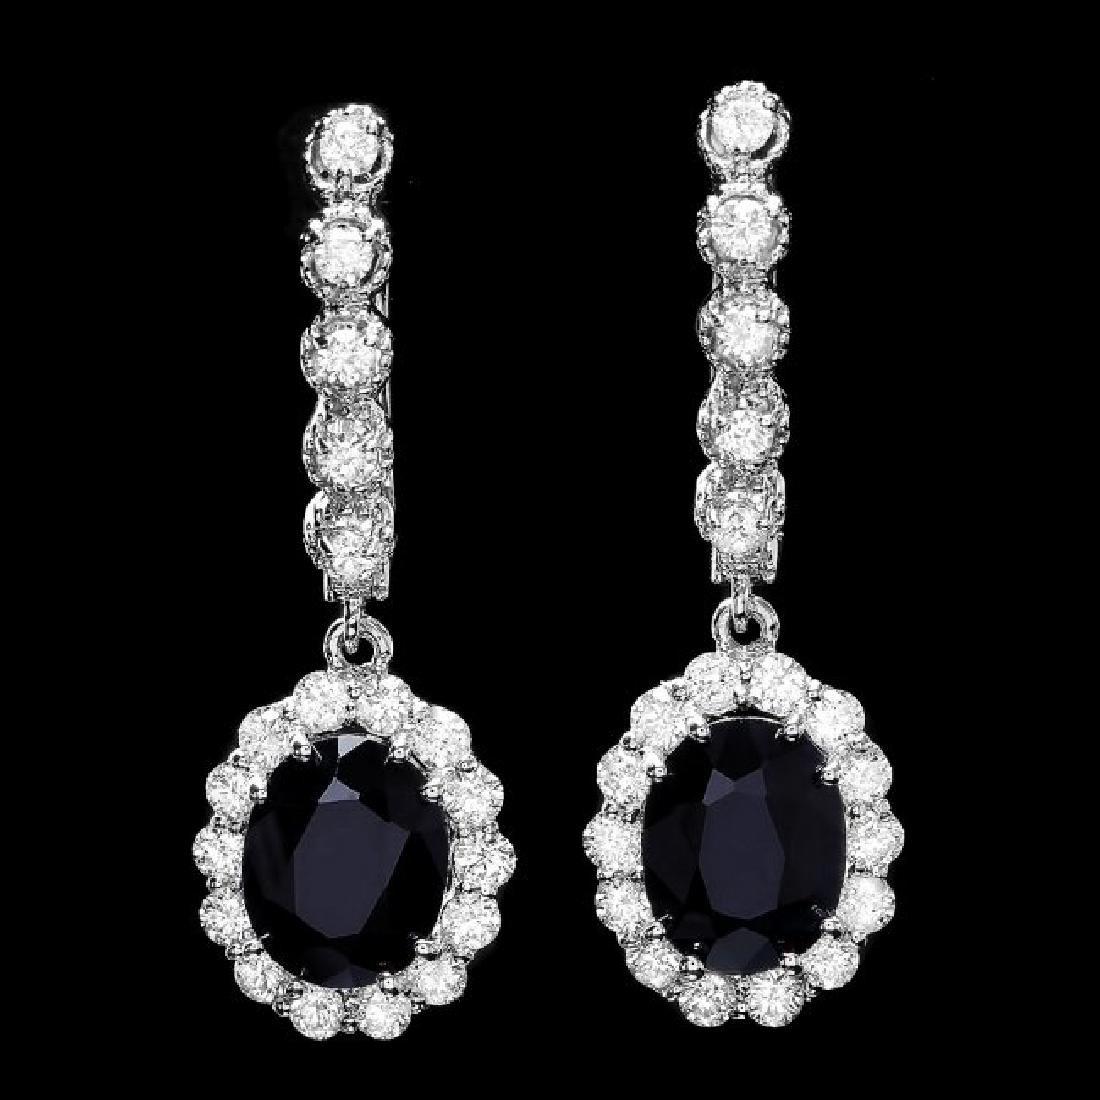 14k Gold 4ct Sapphire 1.35ct Diamond Earrings